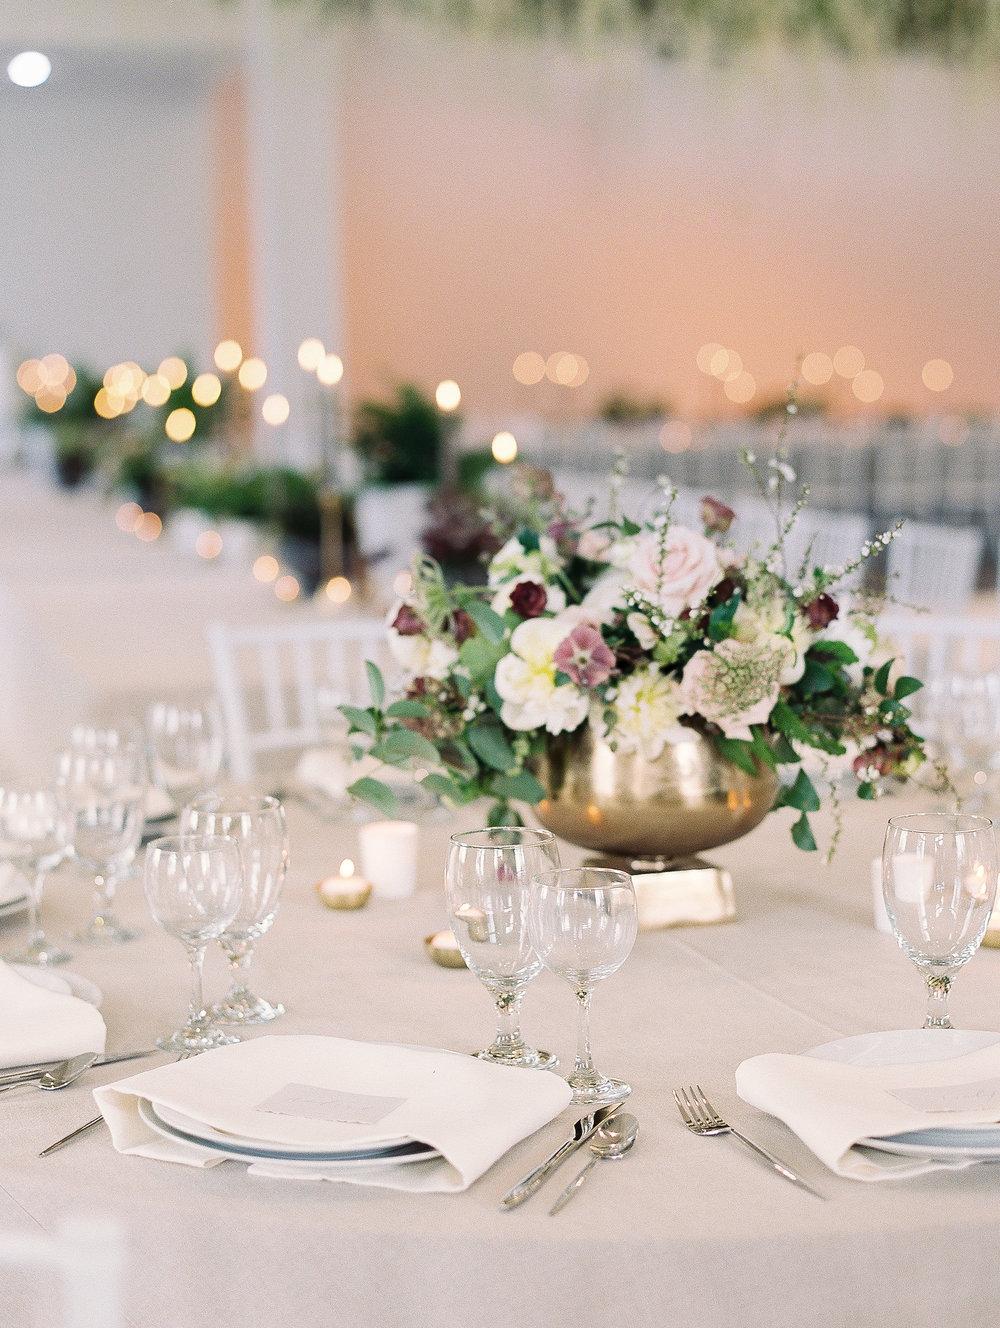 jessica-zimmerman-southern-wedding-reception-family-table.jpg